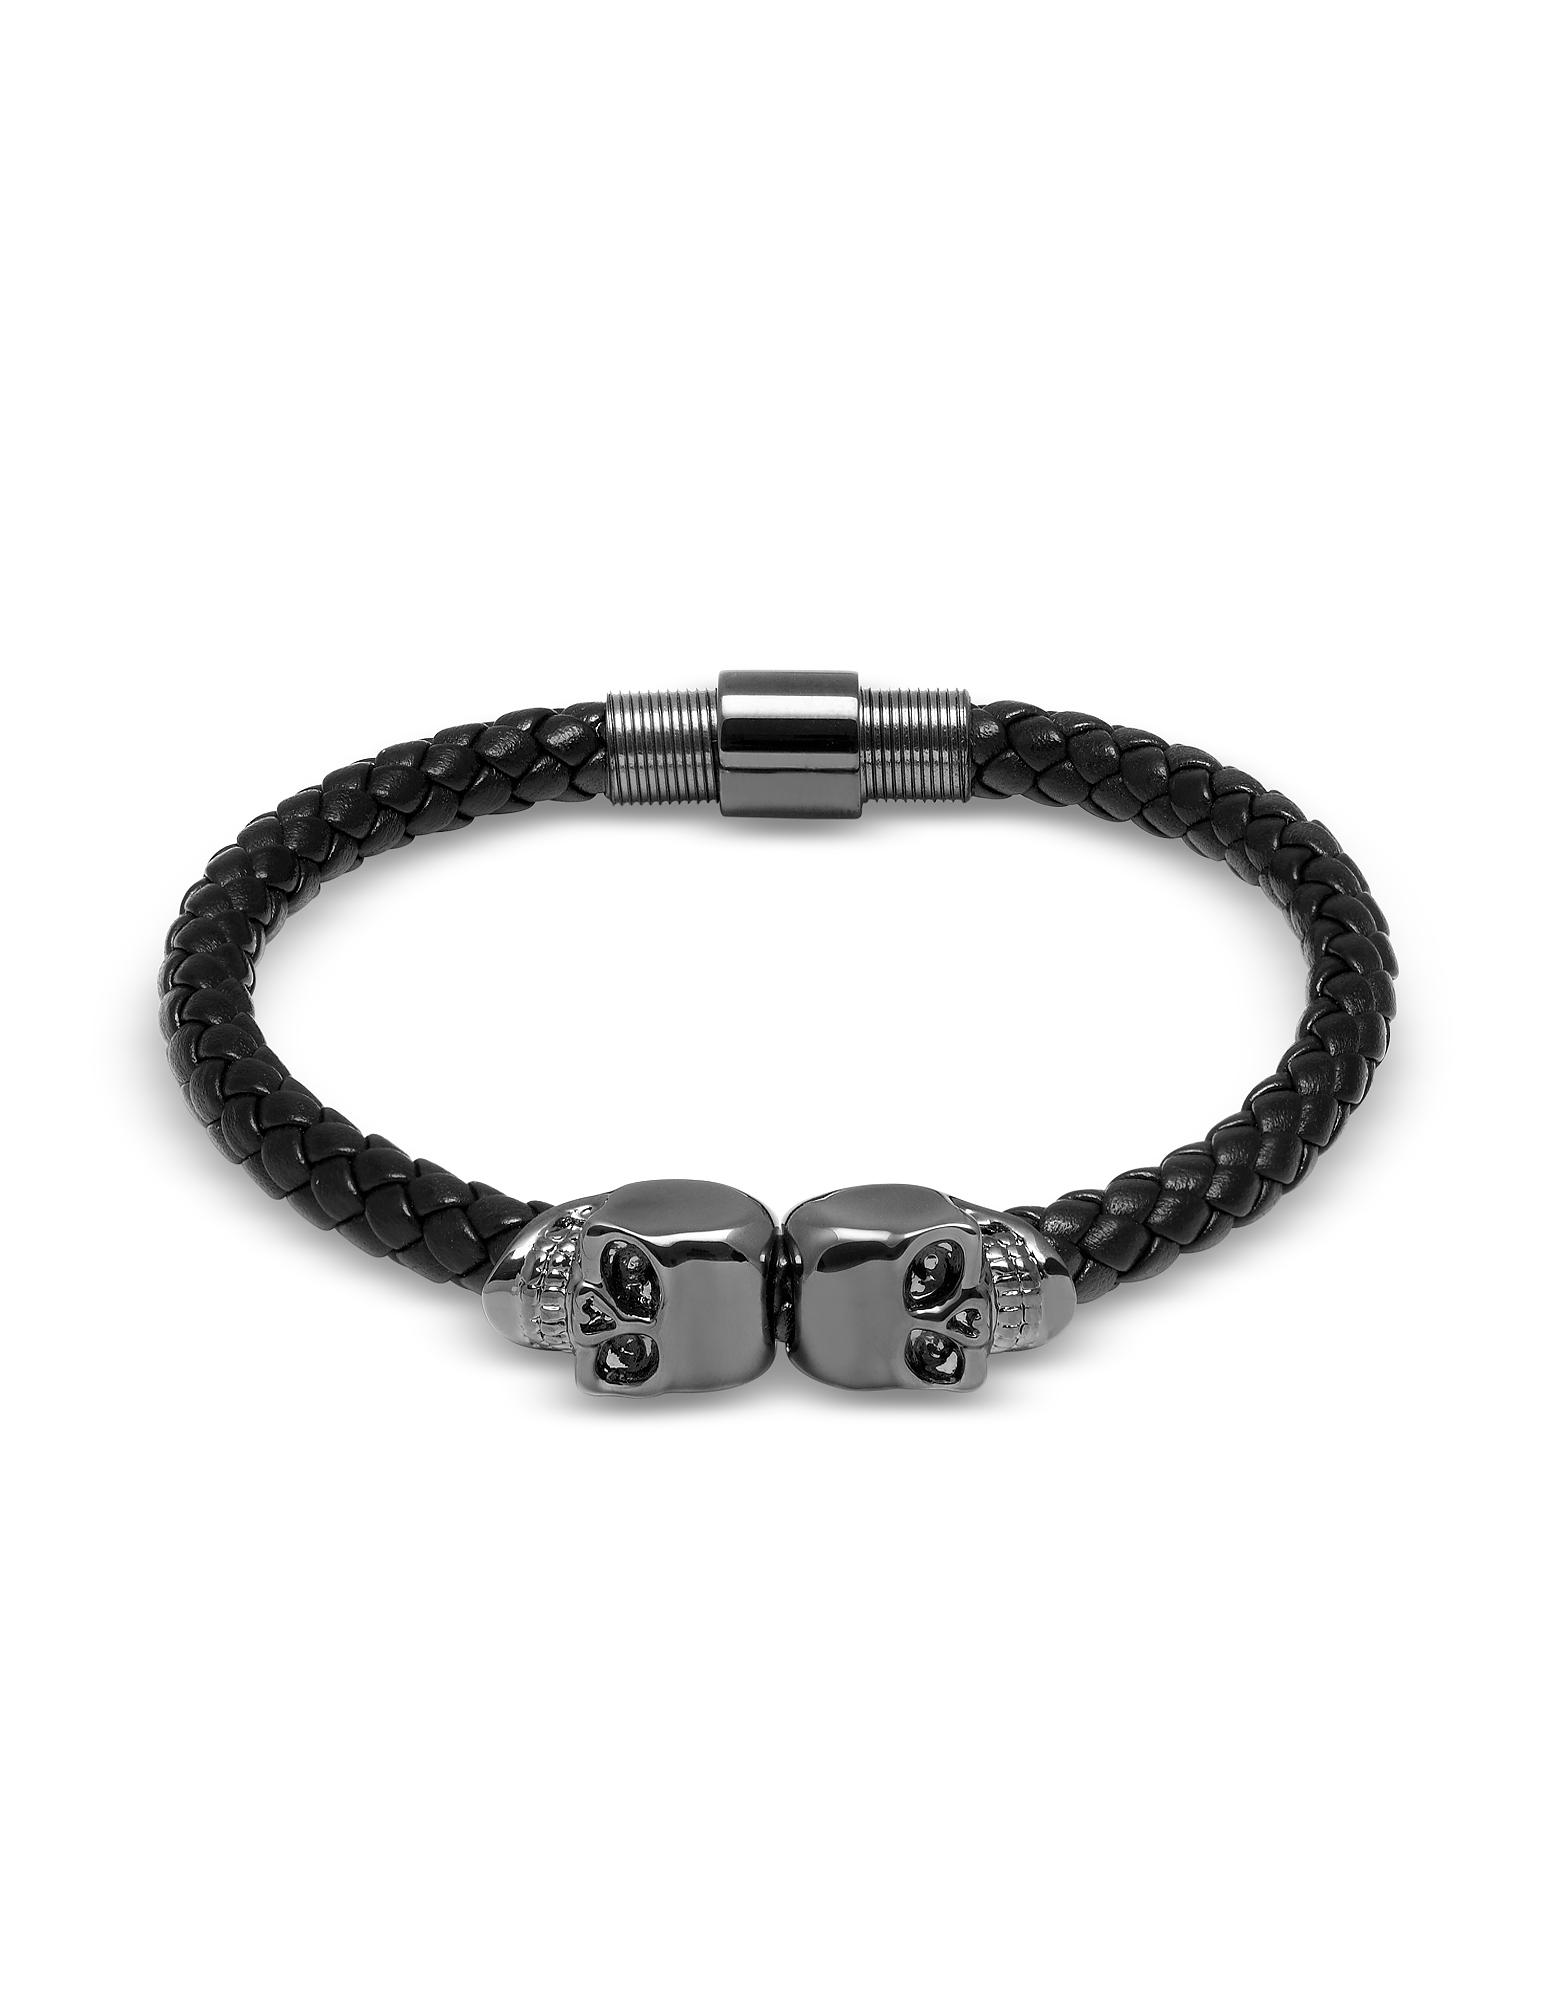 Northskull Men's Bracelets, Black Nappa Leather w/ Gunmetal Twin Skull Bracelet